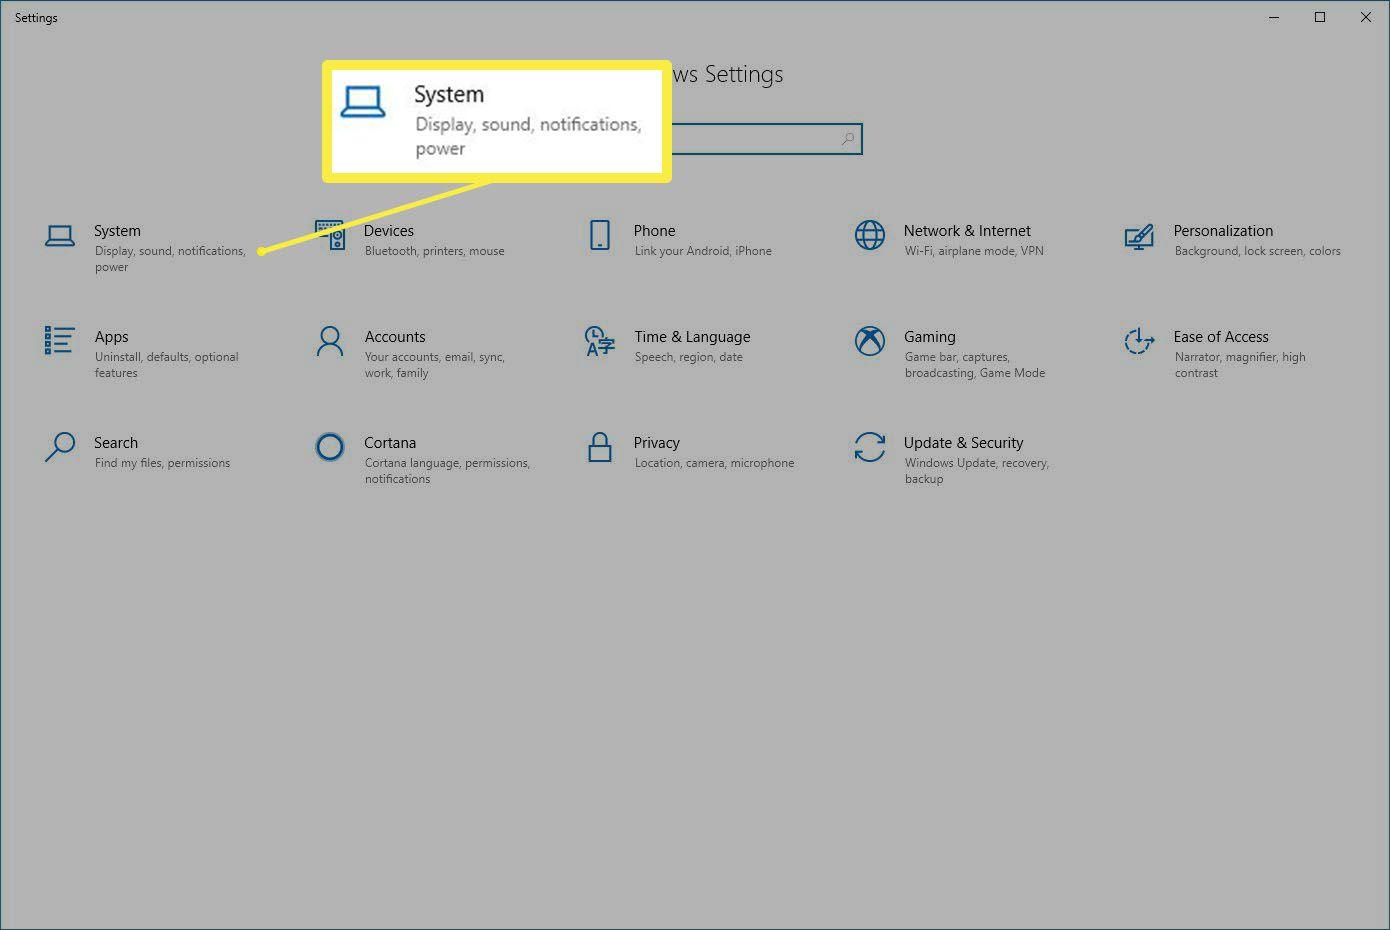 The Windows Settings dialog box.